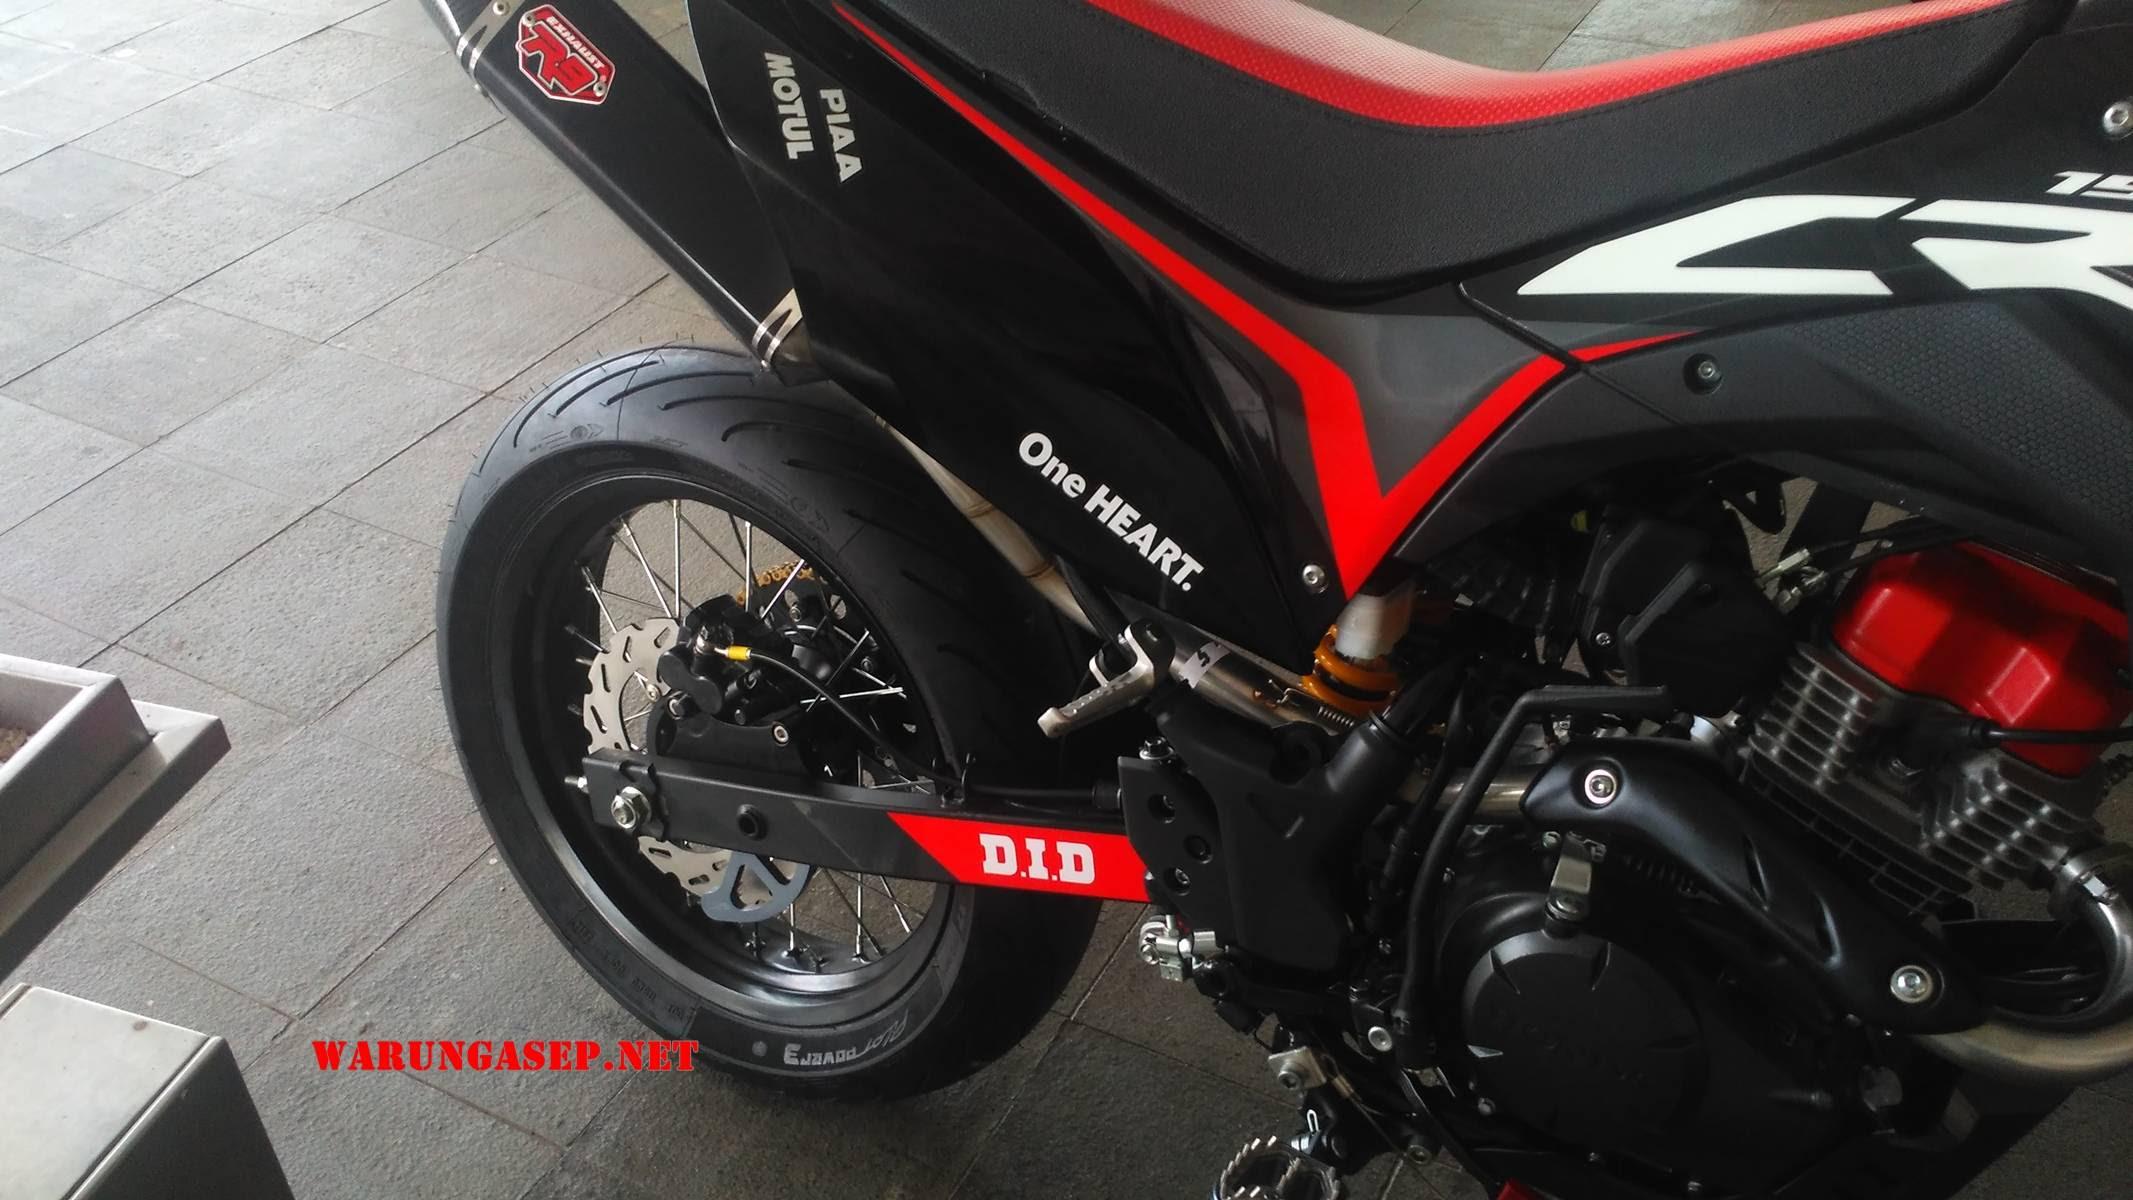 Honda Crf150l 2018 187 Warungasep WARUNGASEP